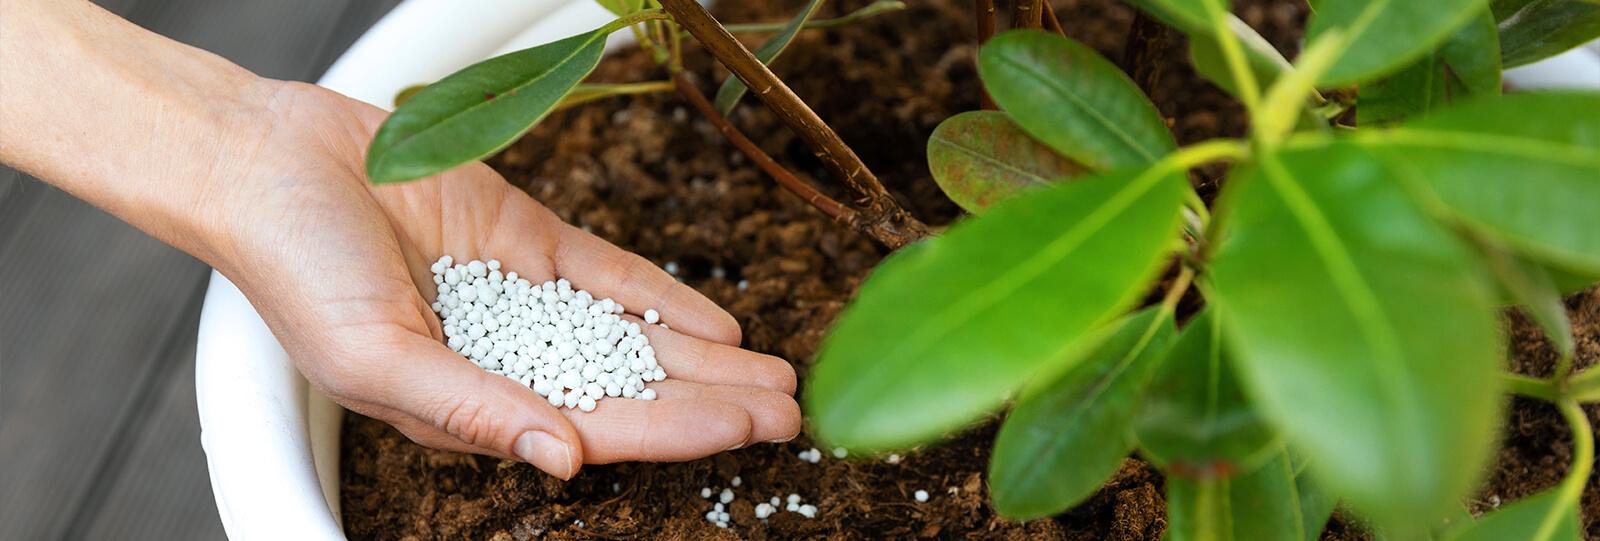 plants for all seasons fertilizing trees shrubs granulated fertilizer potted shrub